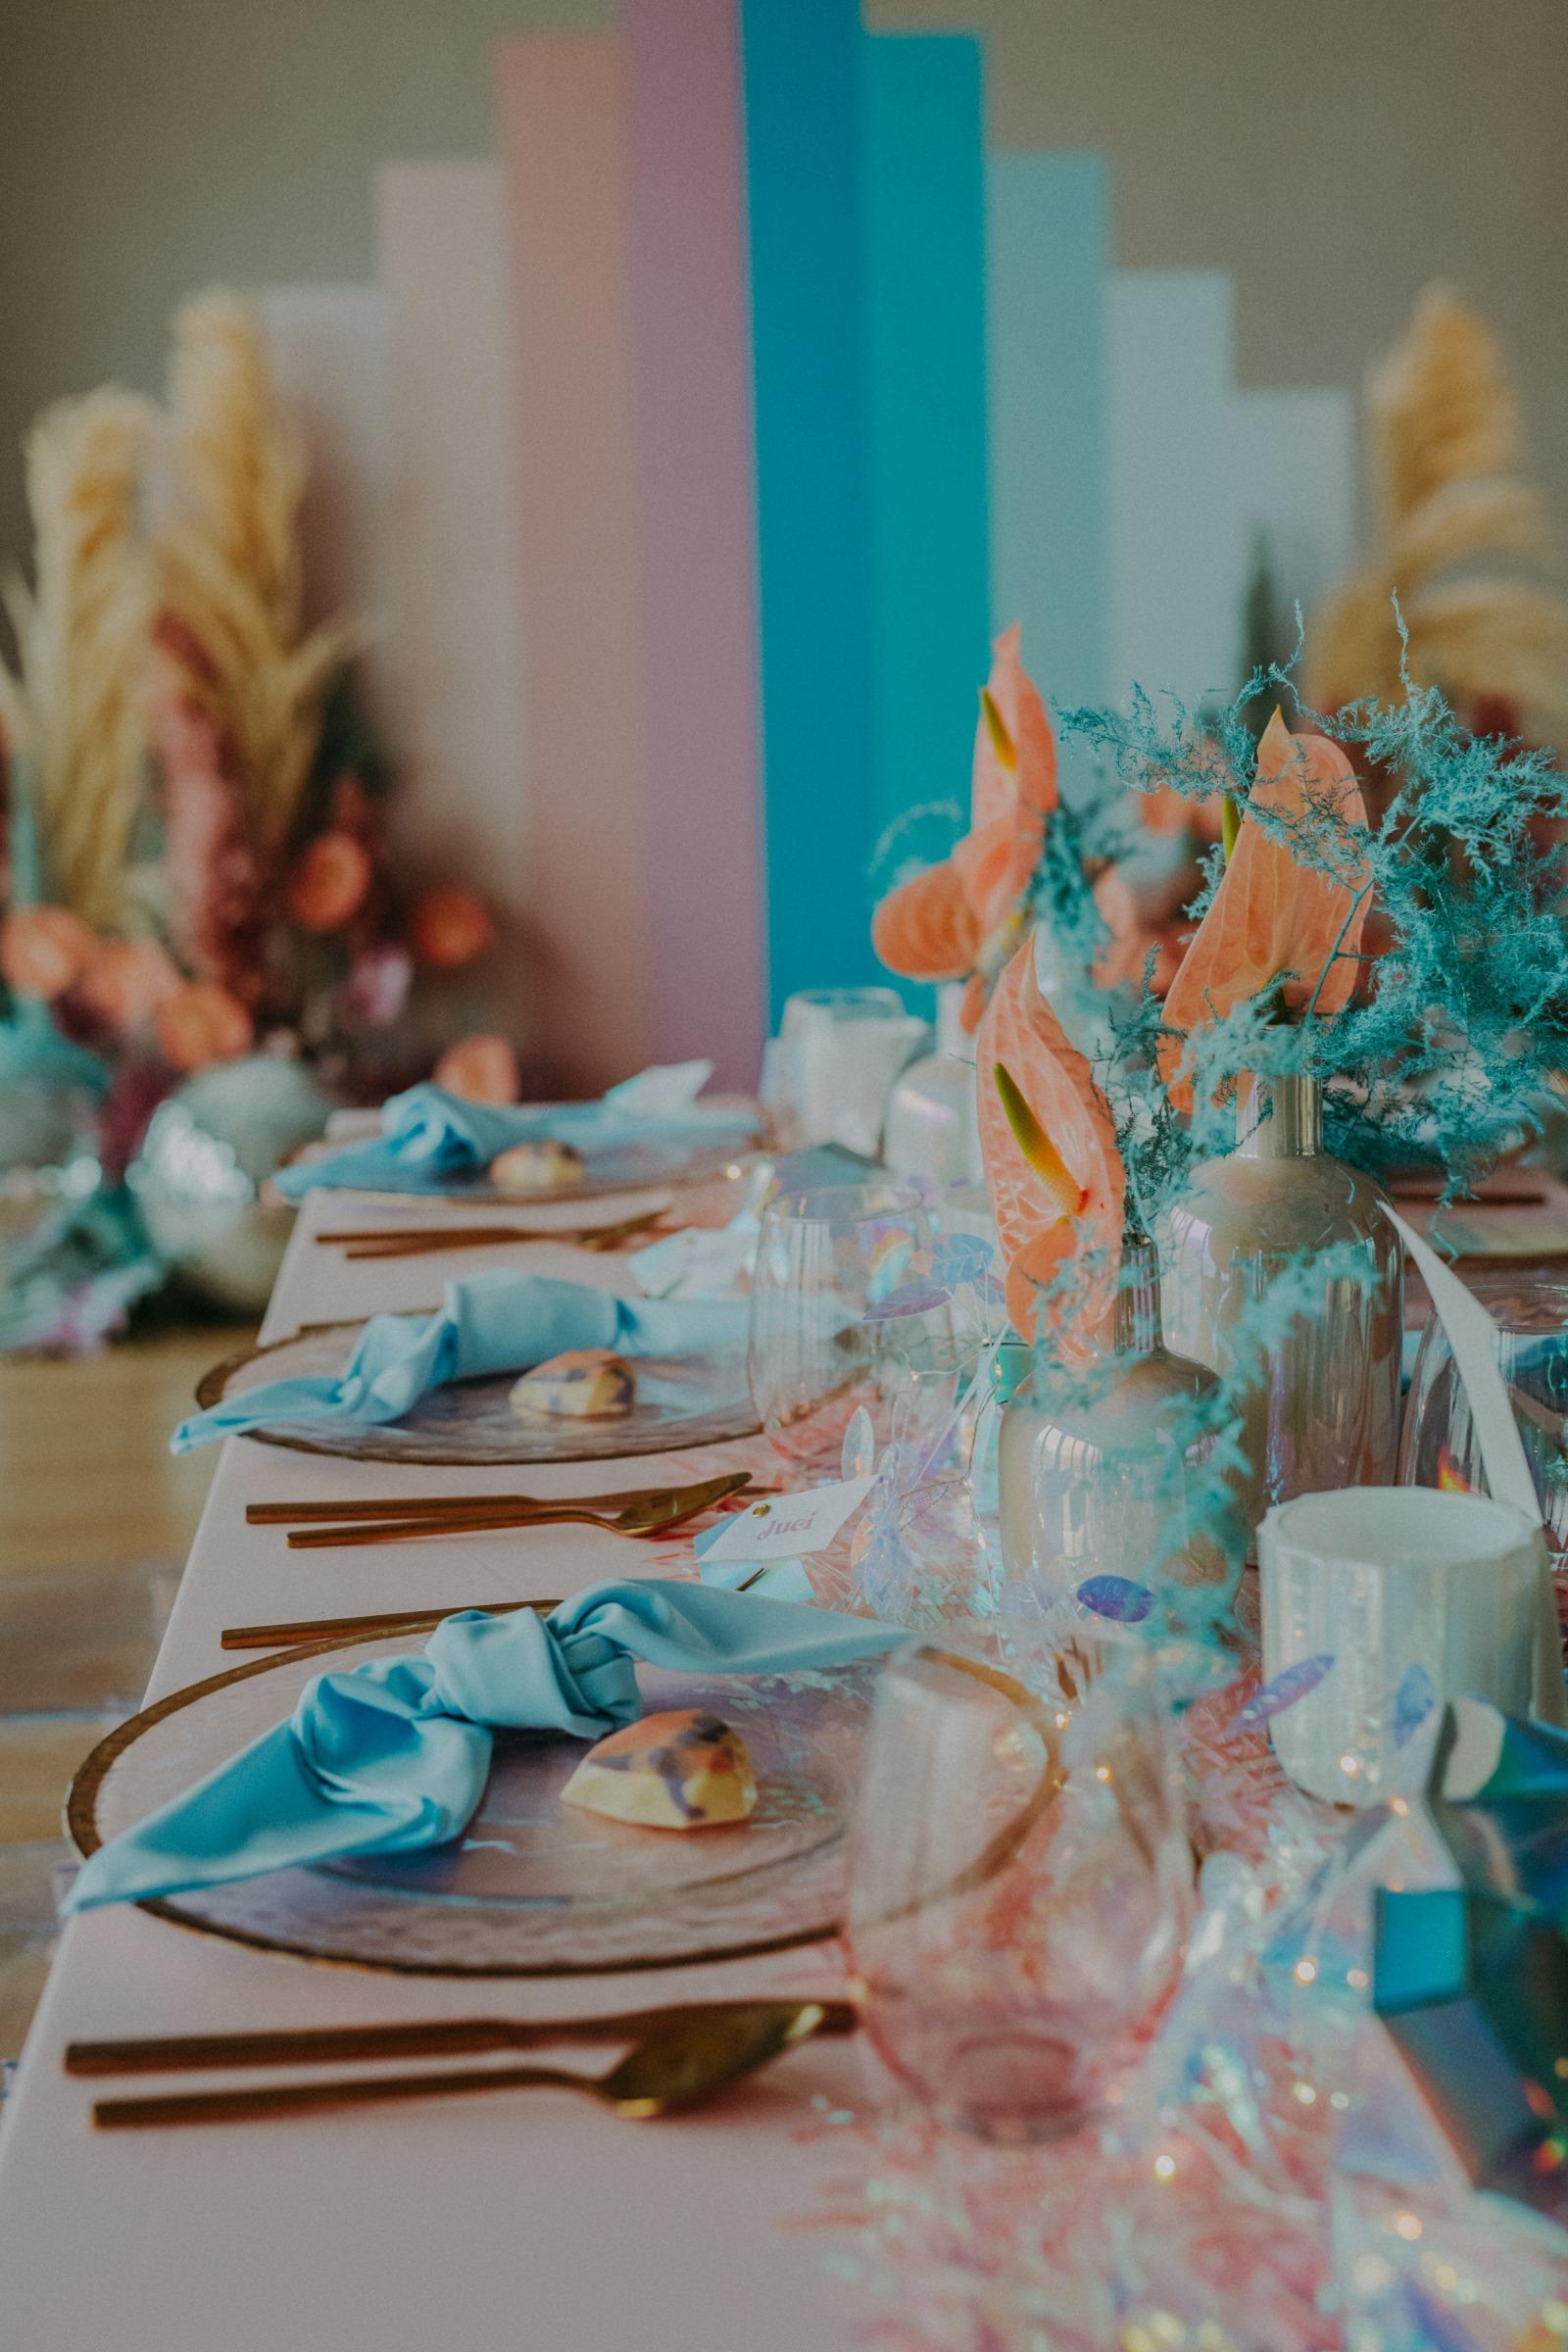 colourful pastel wedding - unconventional wedding - alternative wedding - modern wedding decor - pastel wedding table - eclectic wedding table